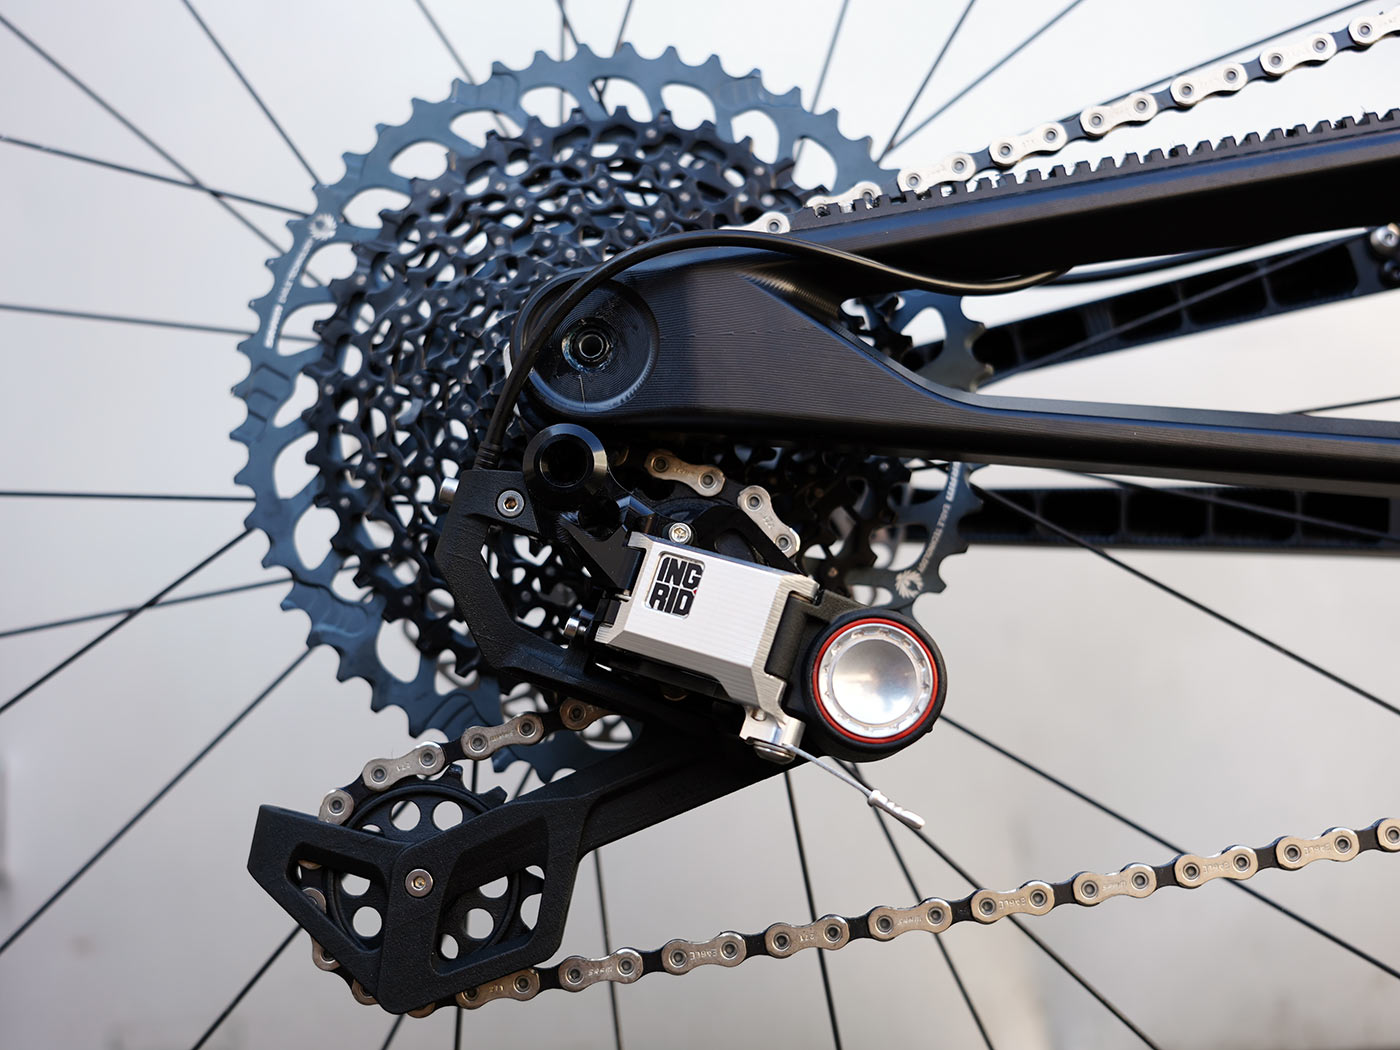 actofive high pivot enduro mountain bike closeup frame details